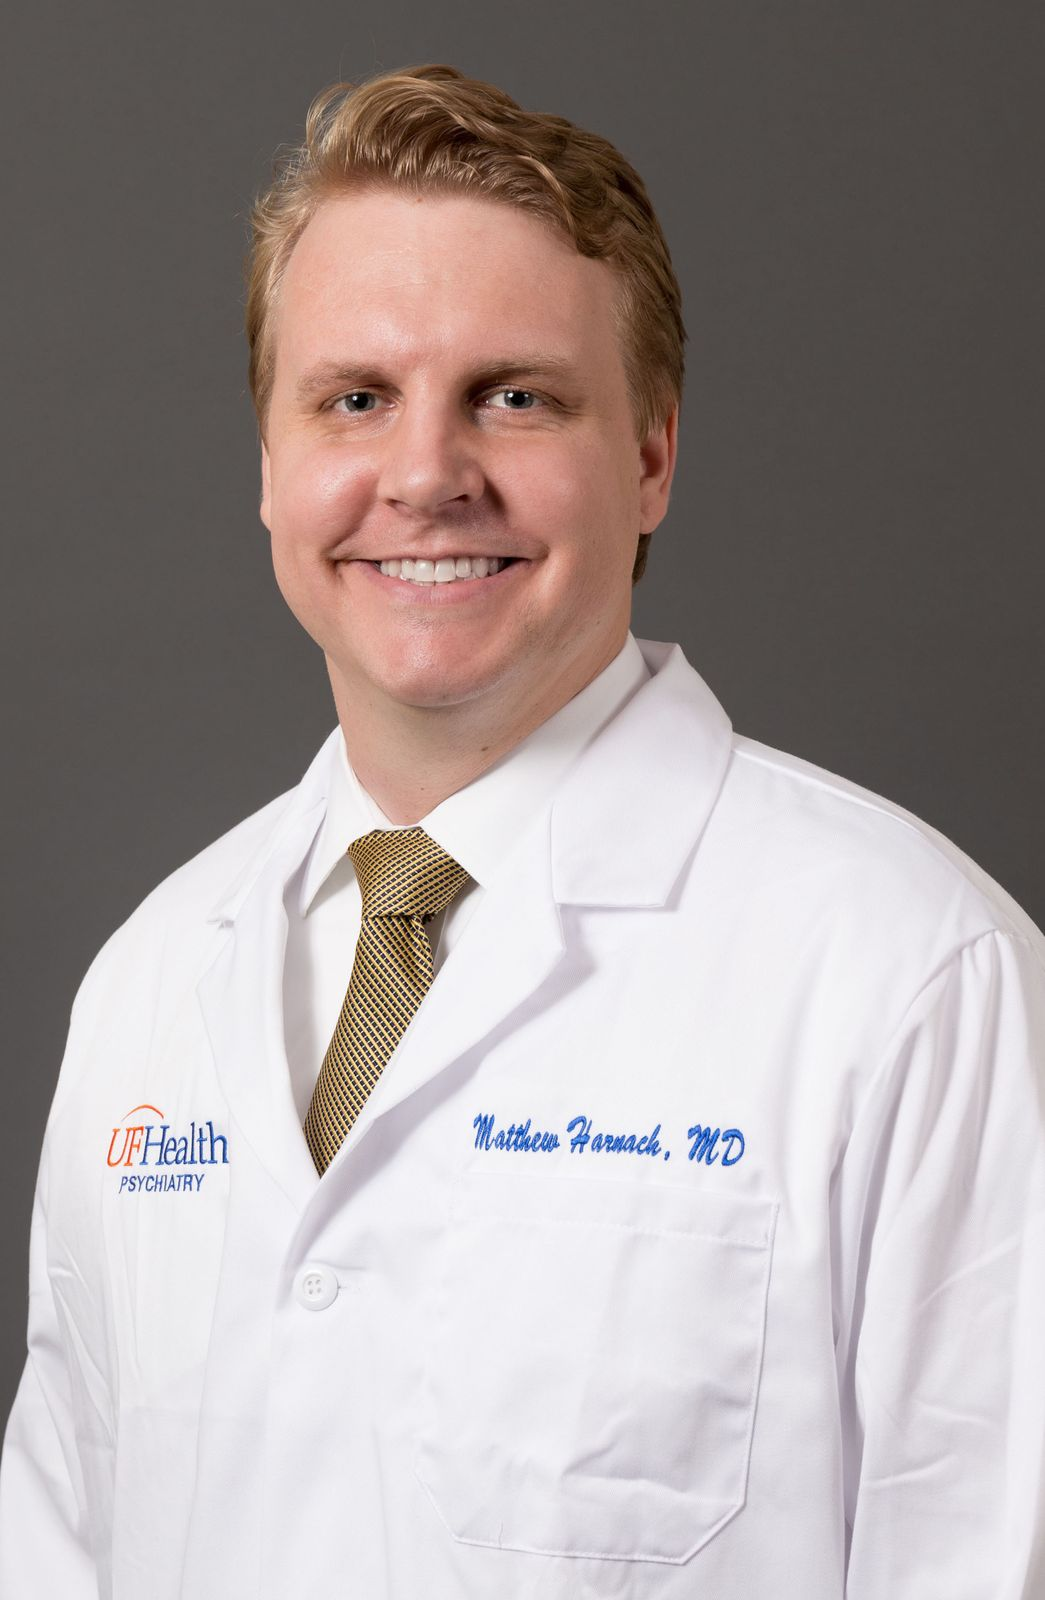 Matthew Harnach, MD